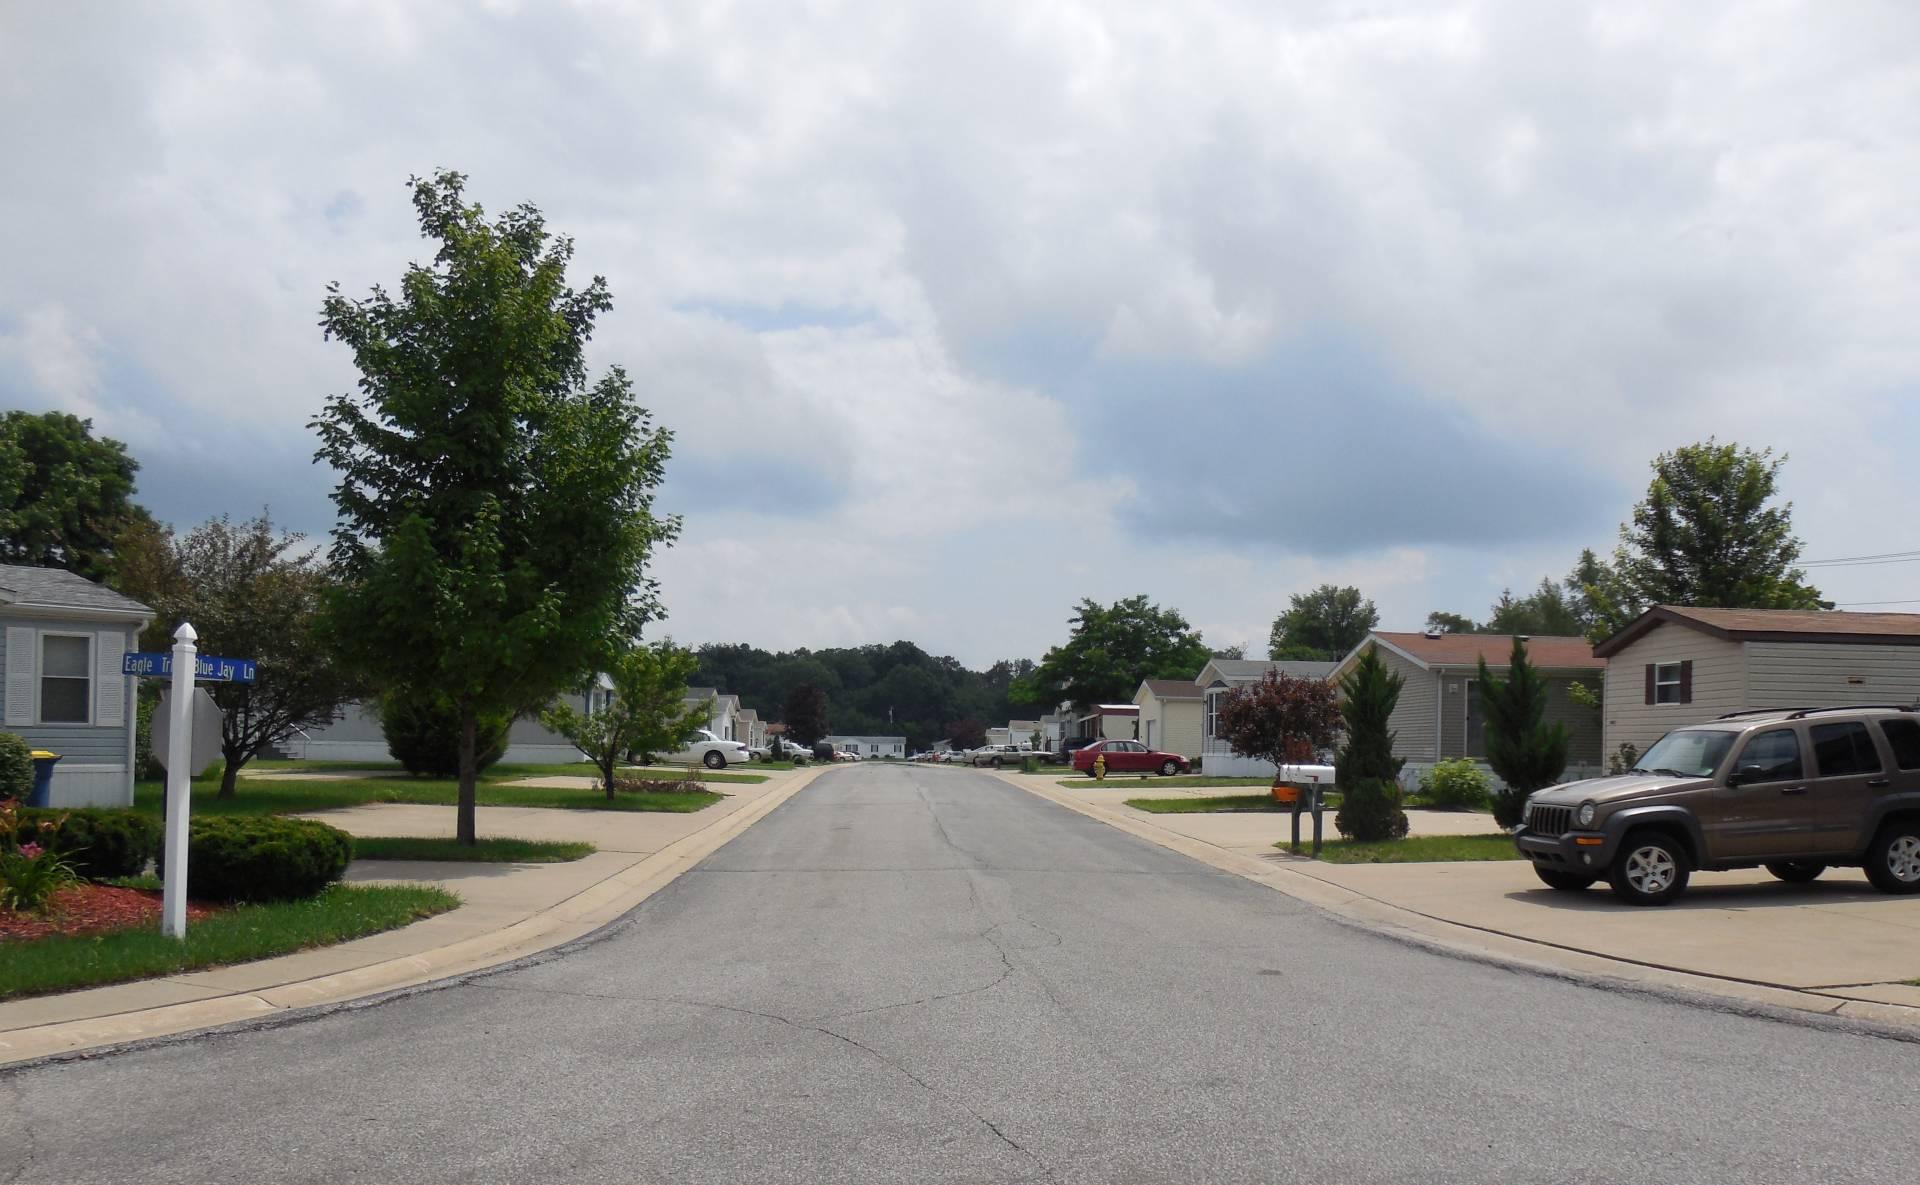 LS Willow Club Street View #3 7-2013